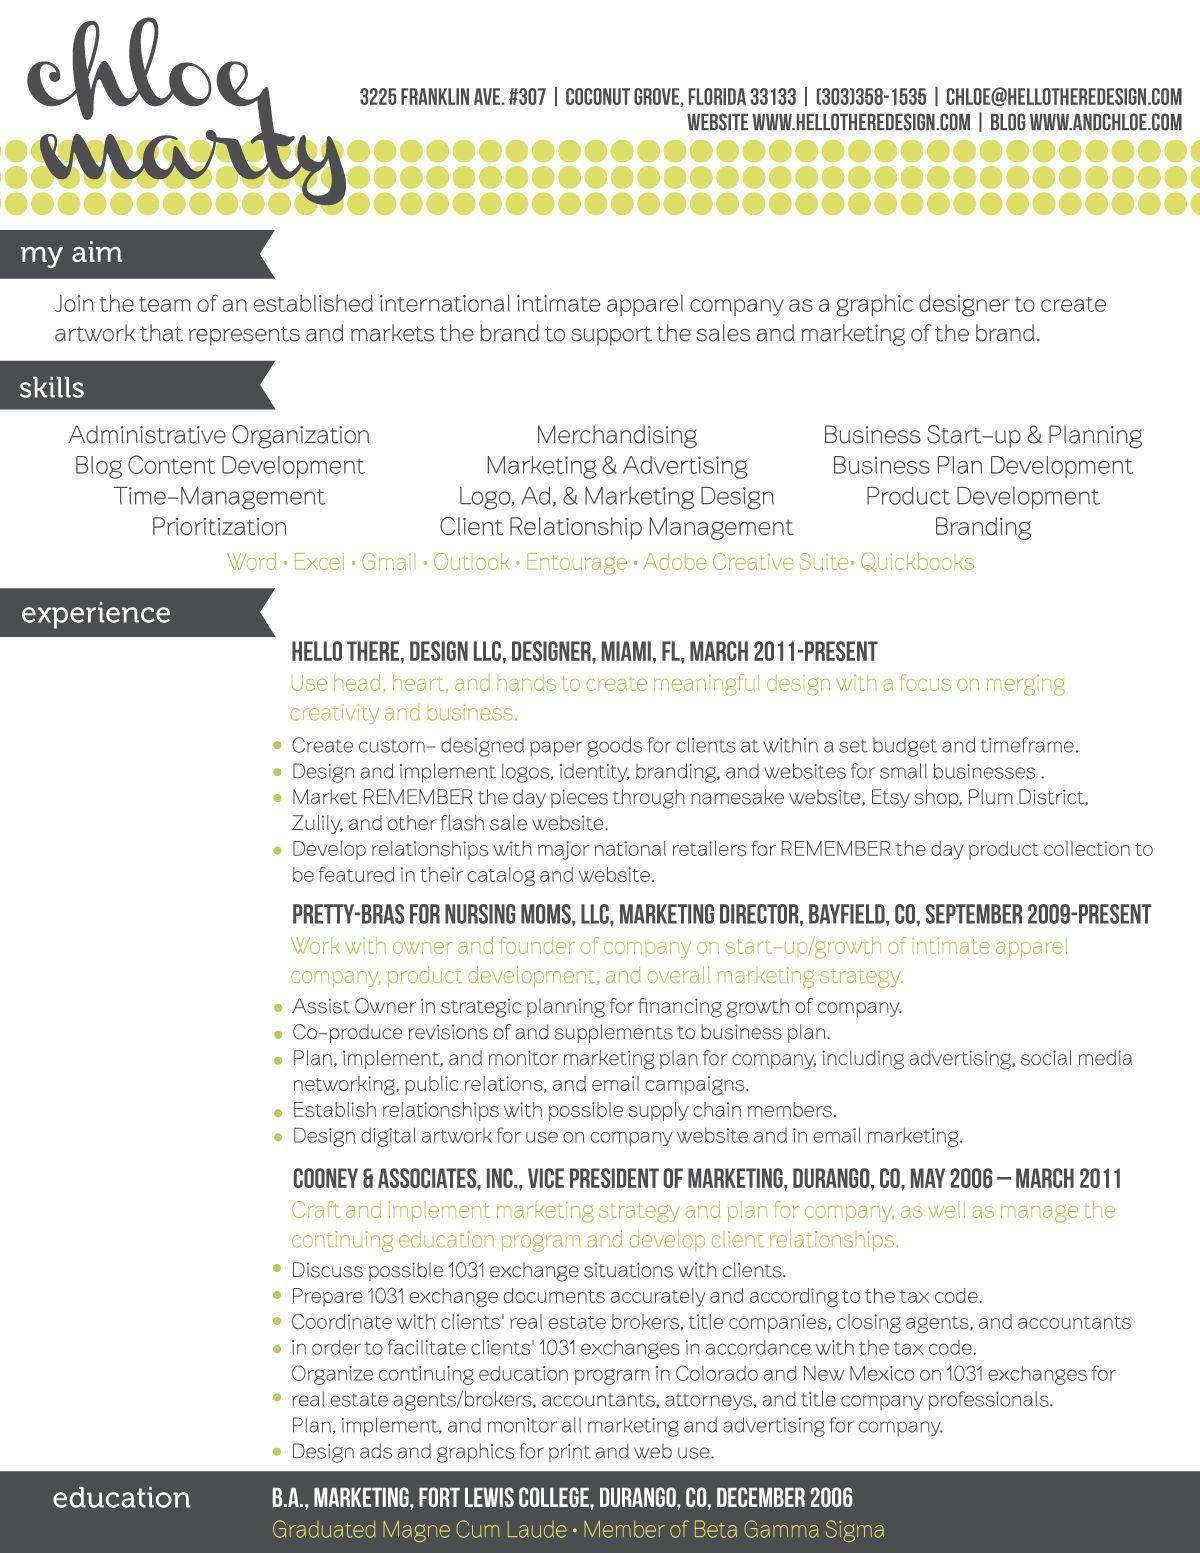 designer resumes, design resumes #webdesign #resumes via www ...